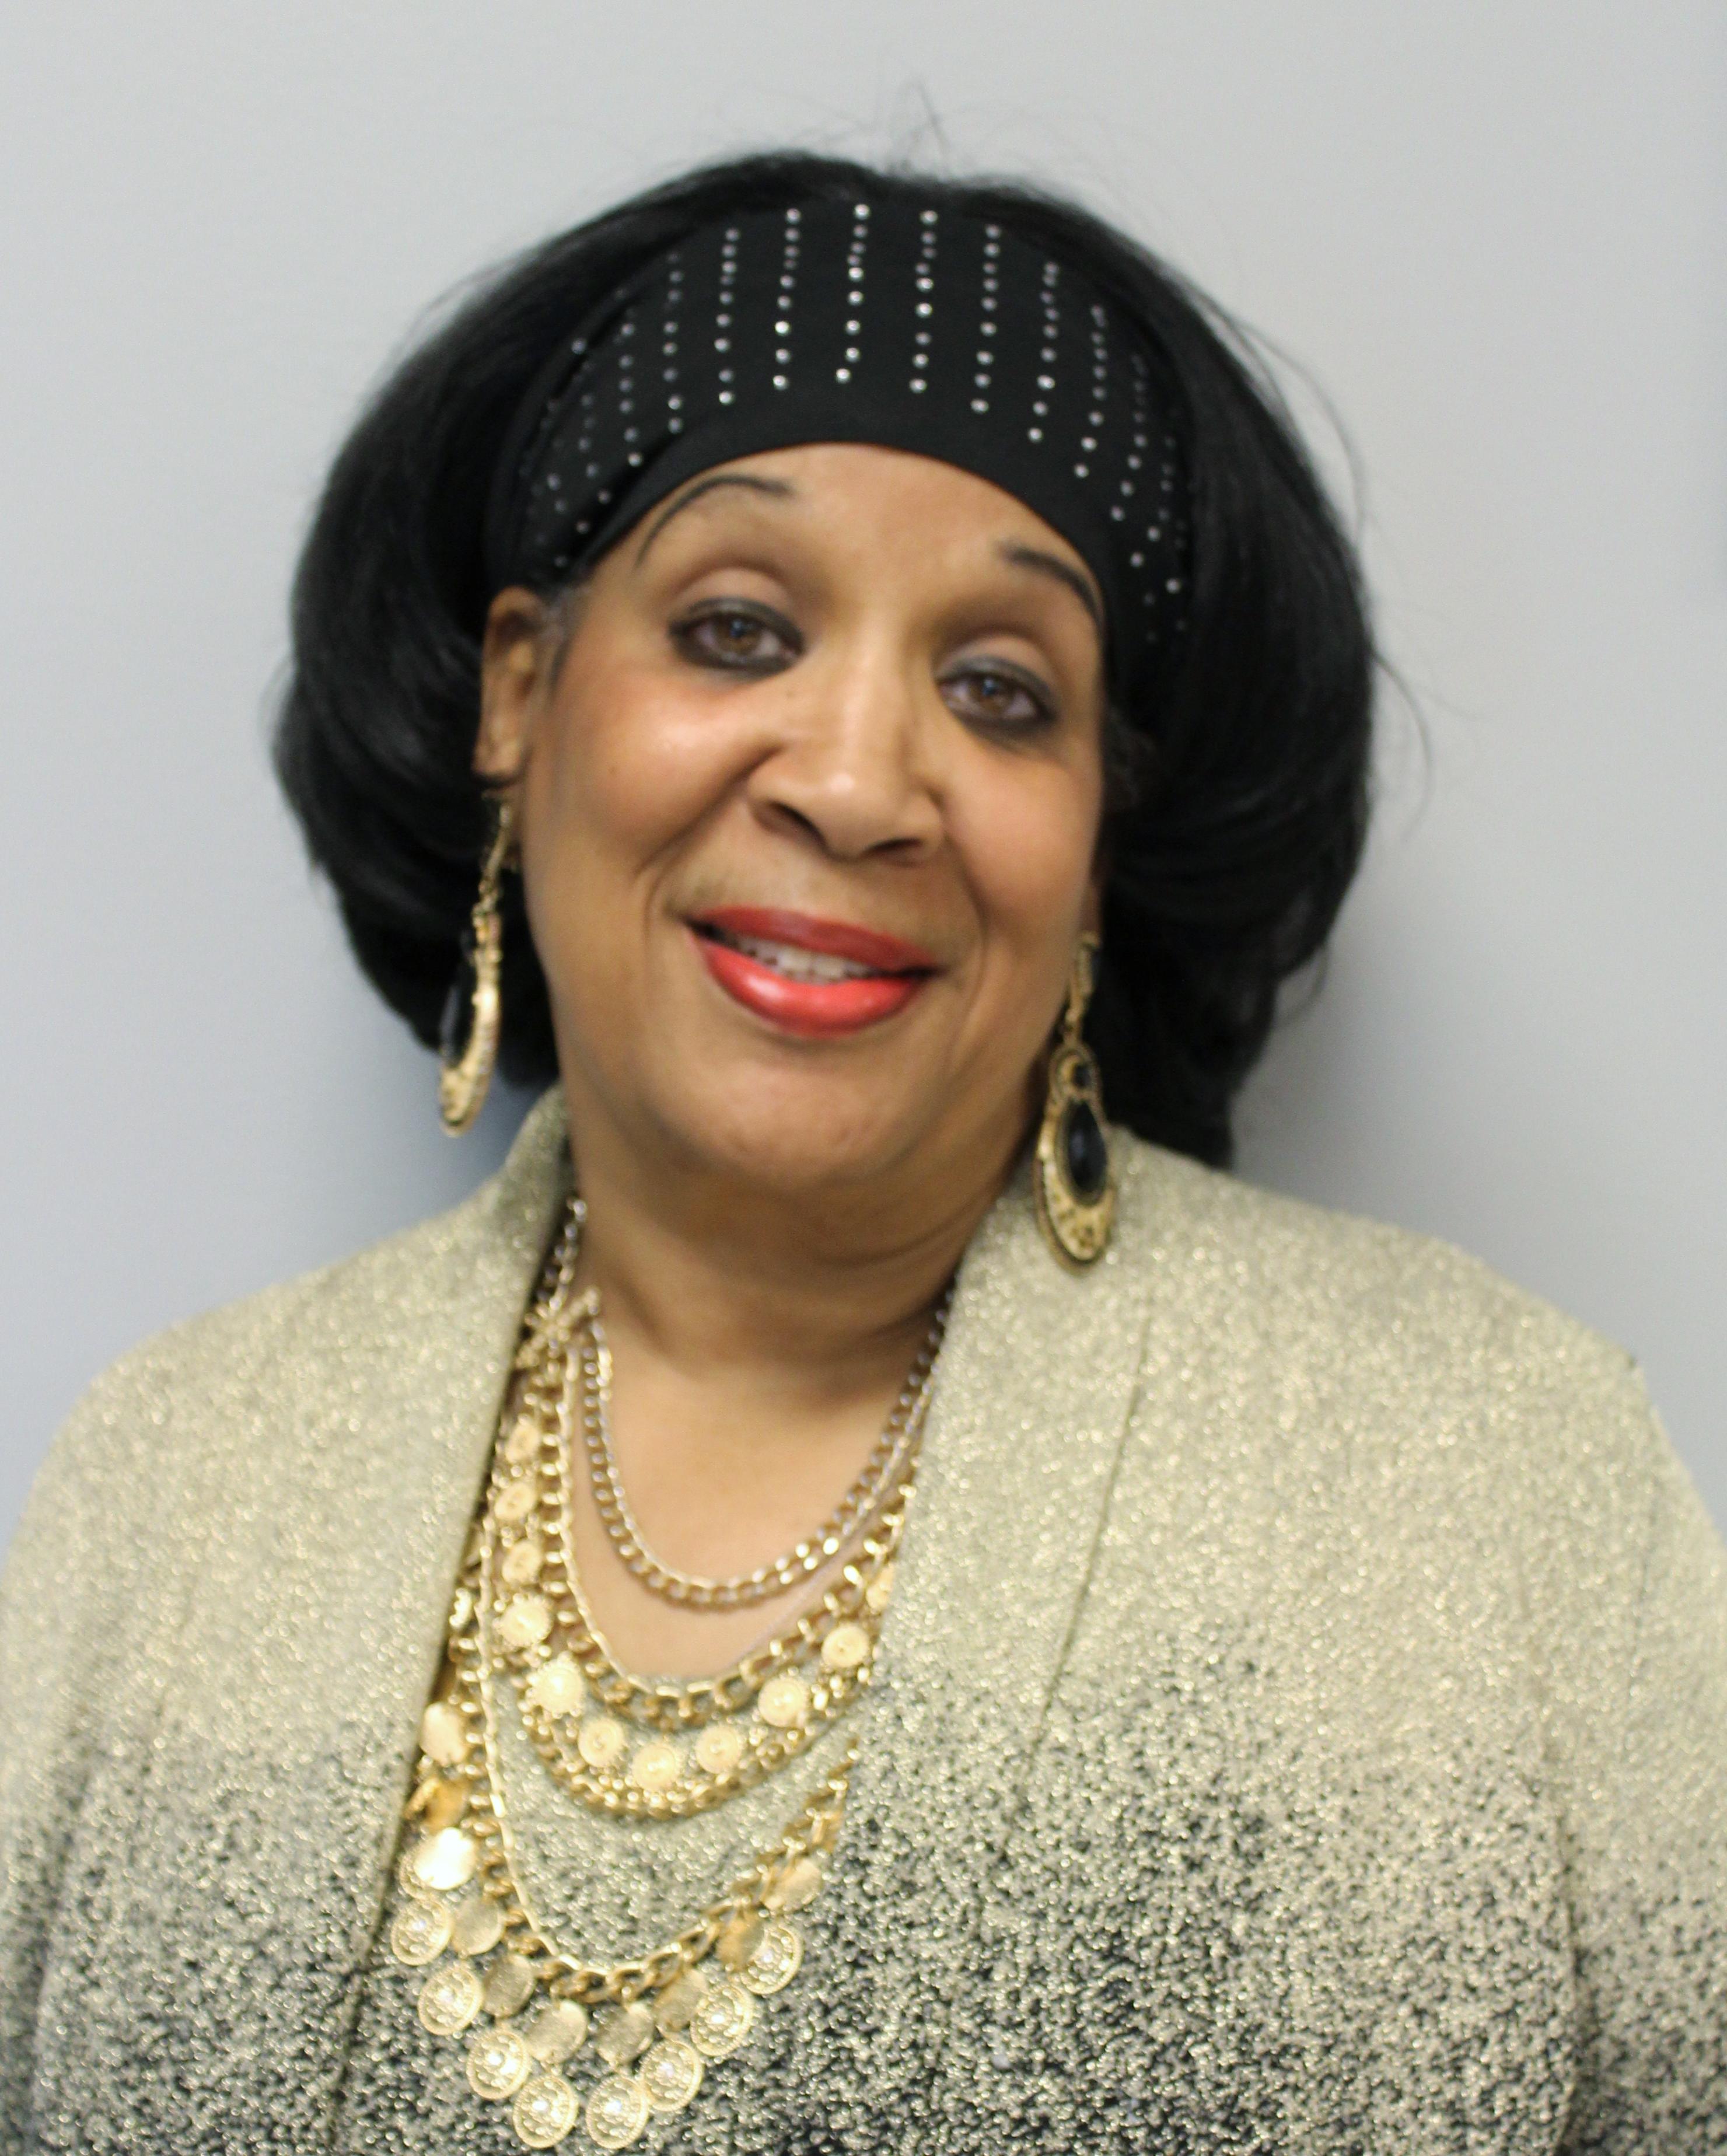 Historian – Dr. Phyllis Adams, Motlow State Community College